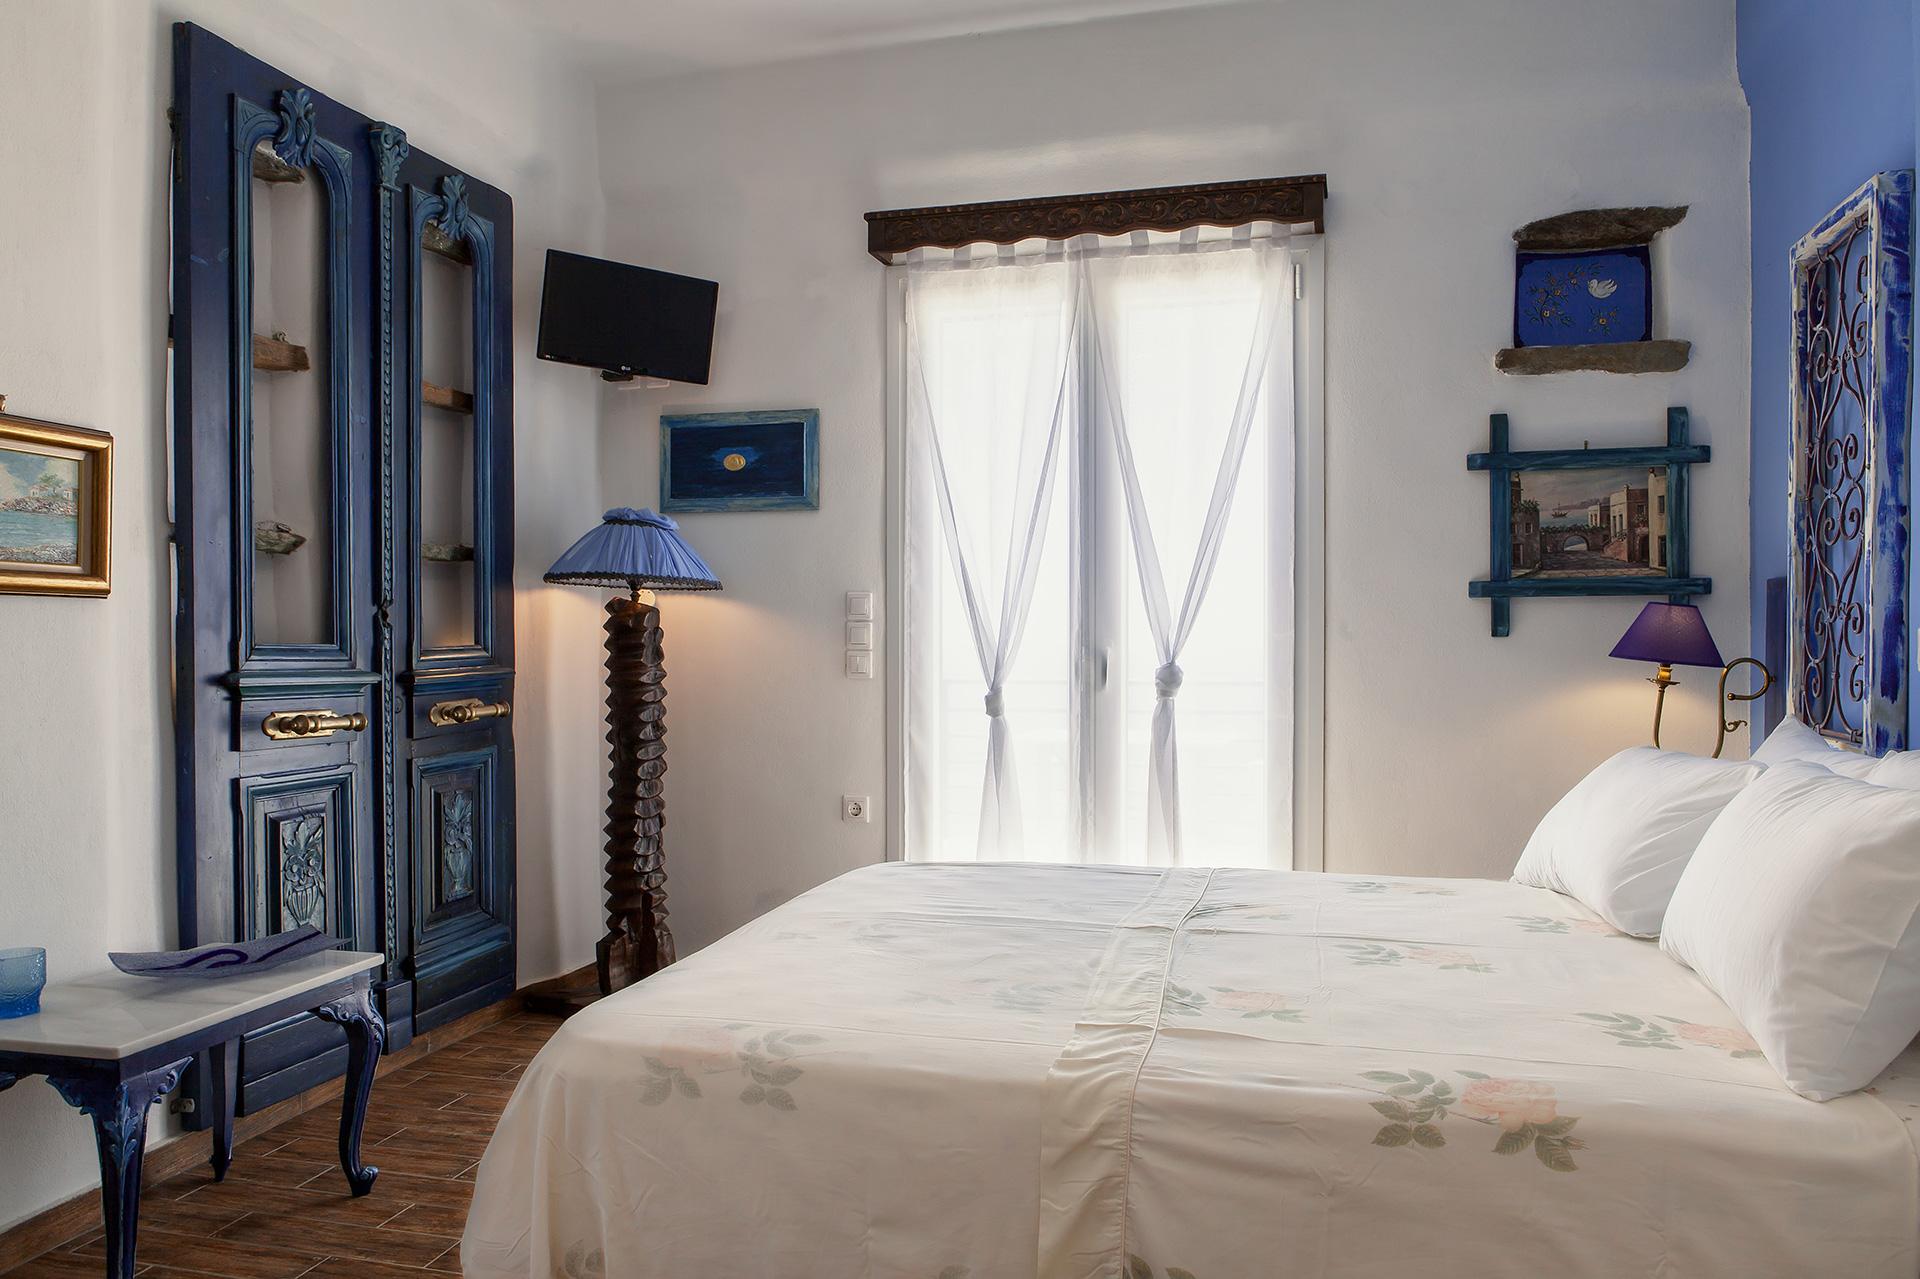 Castria studios blue bedroom king bed | castriastudios.com